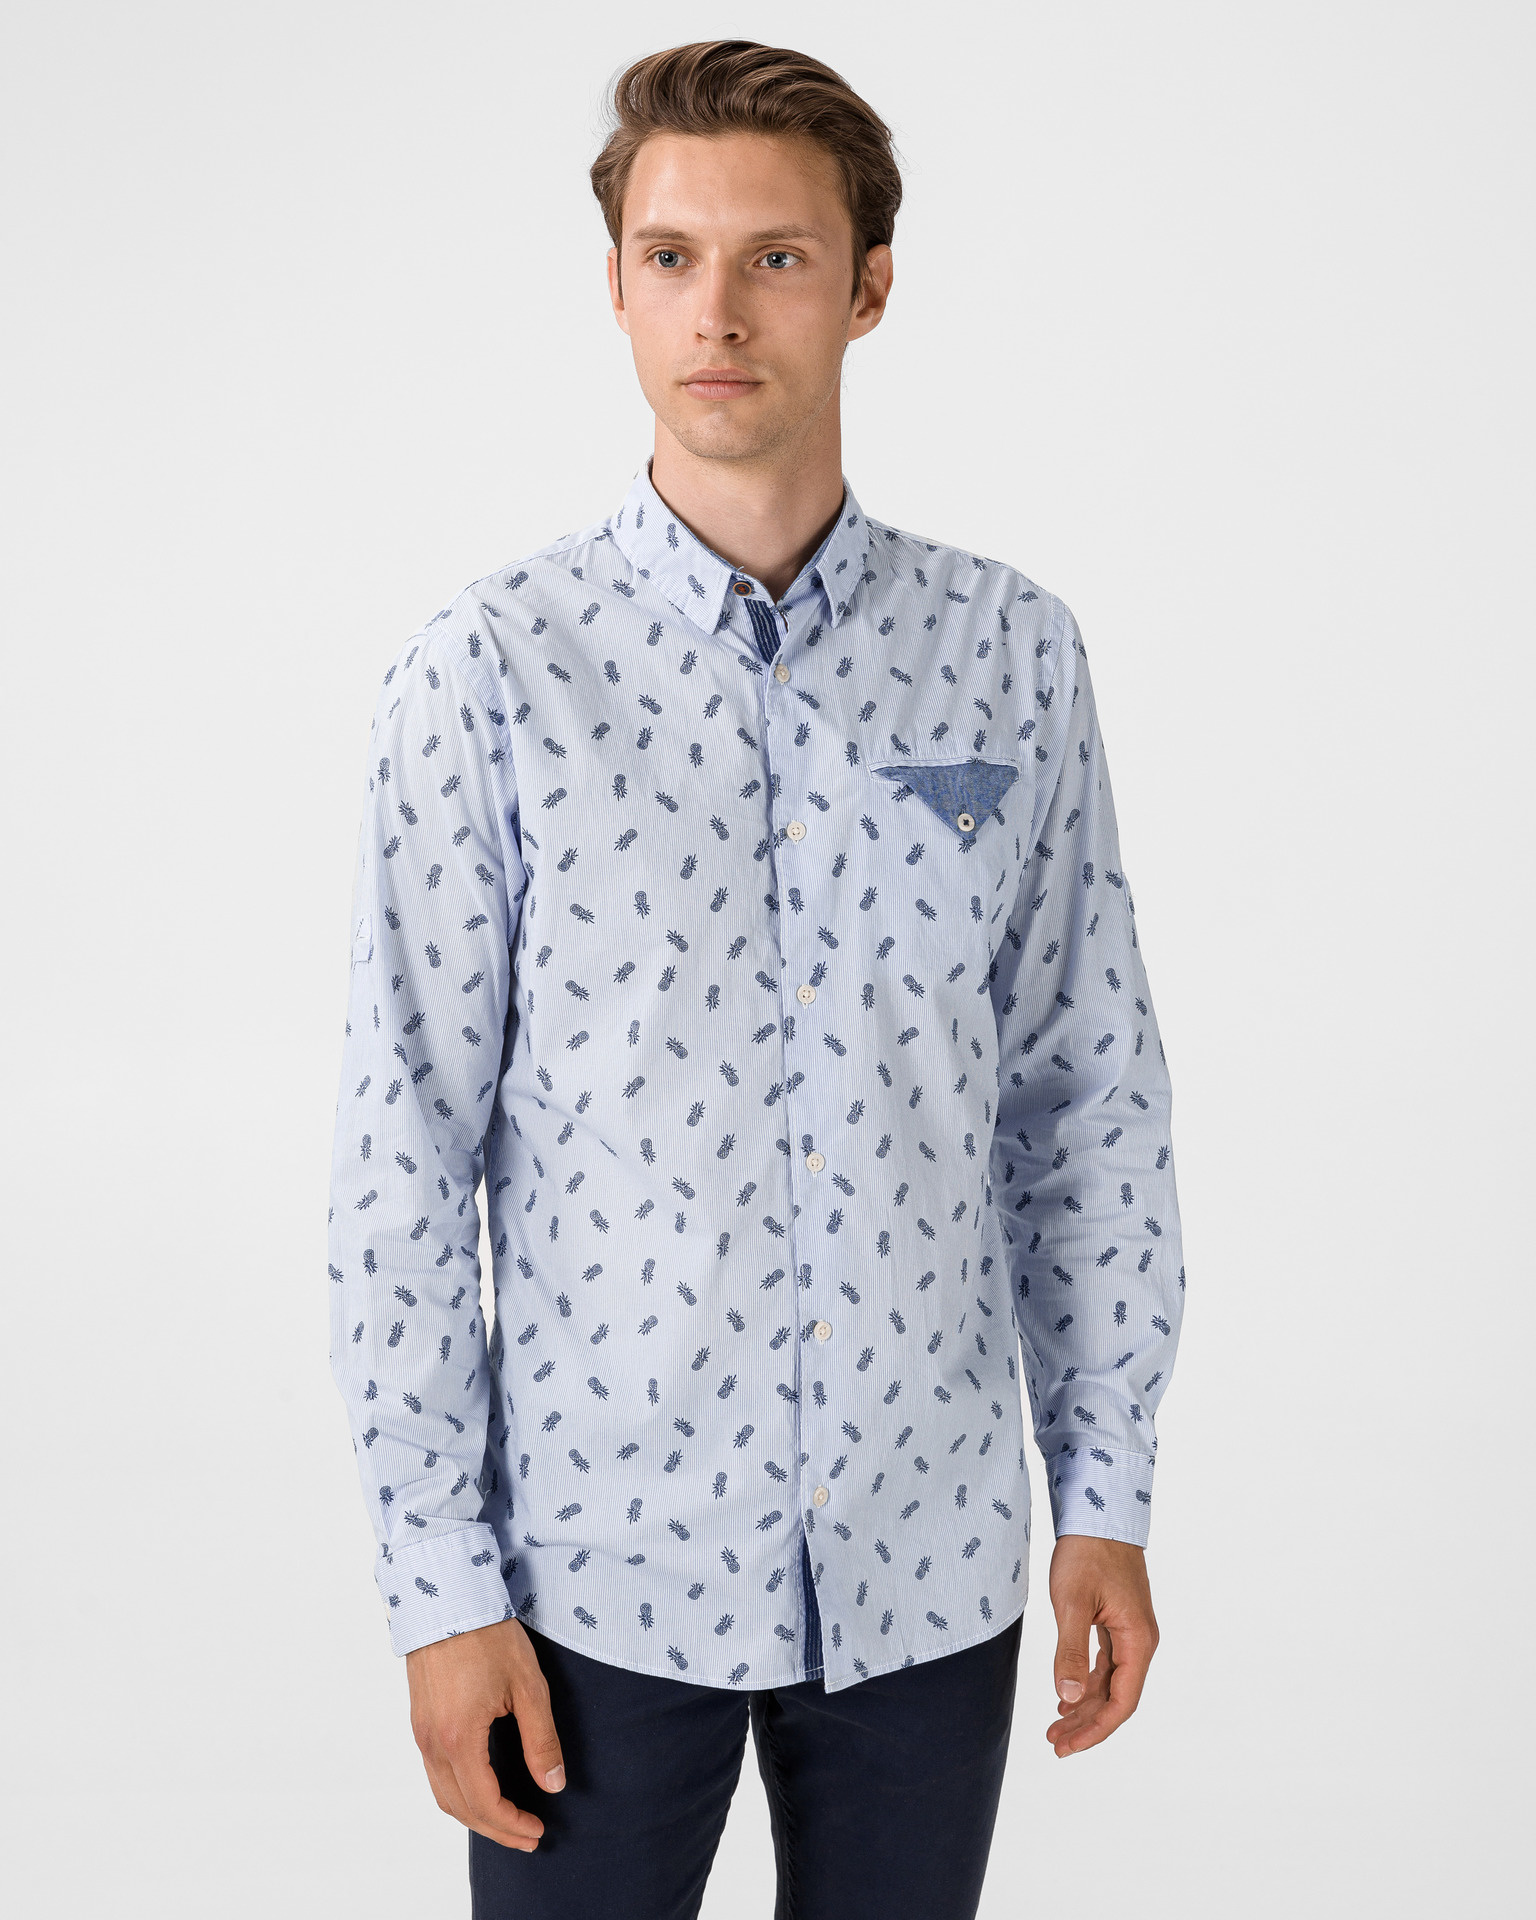 ARNOLDIE chemise-6